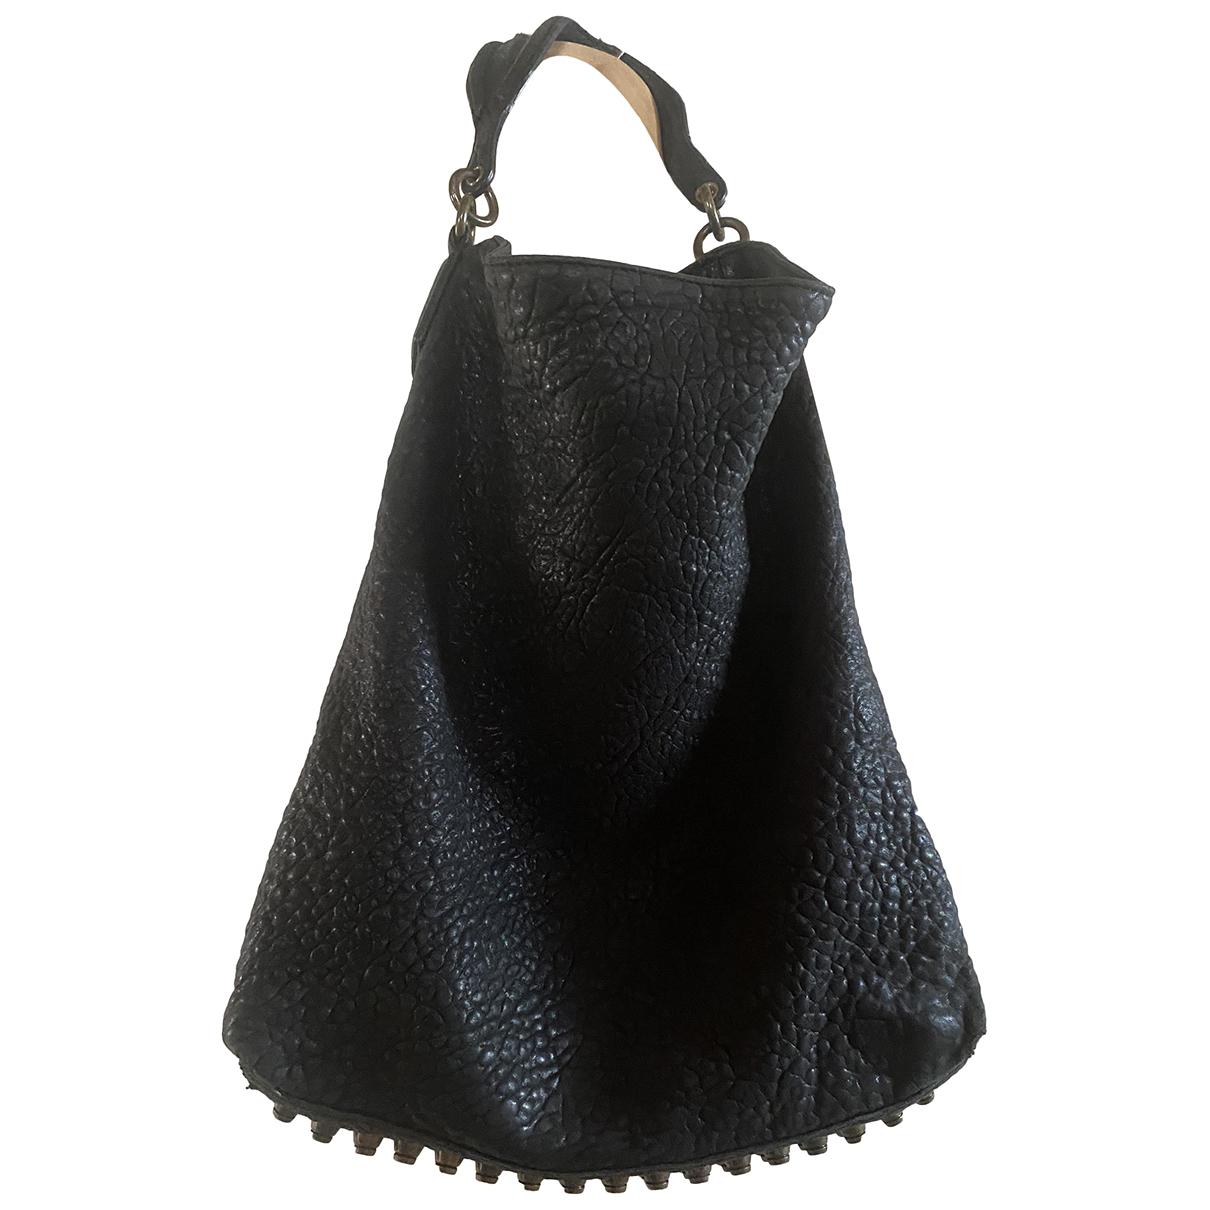 Alexander Wang Darcy Black Leather handbag for Women N